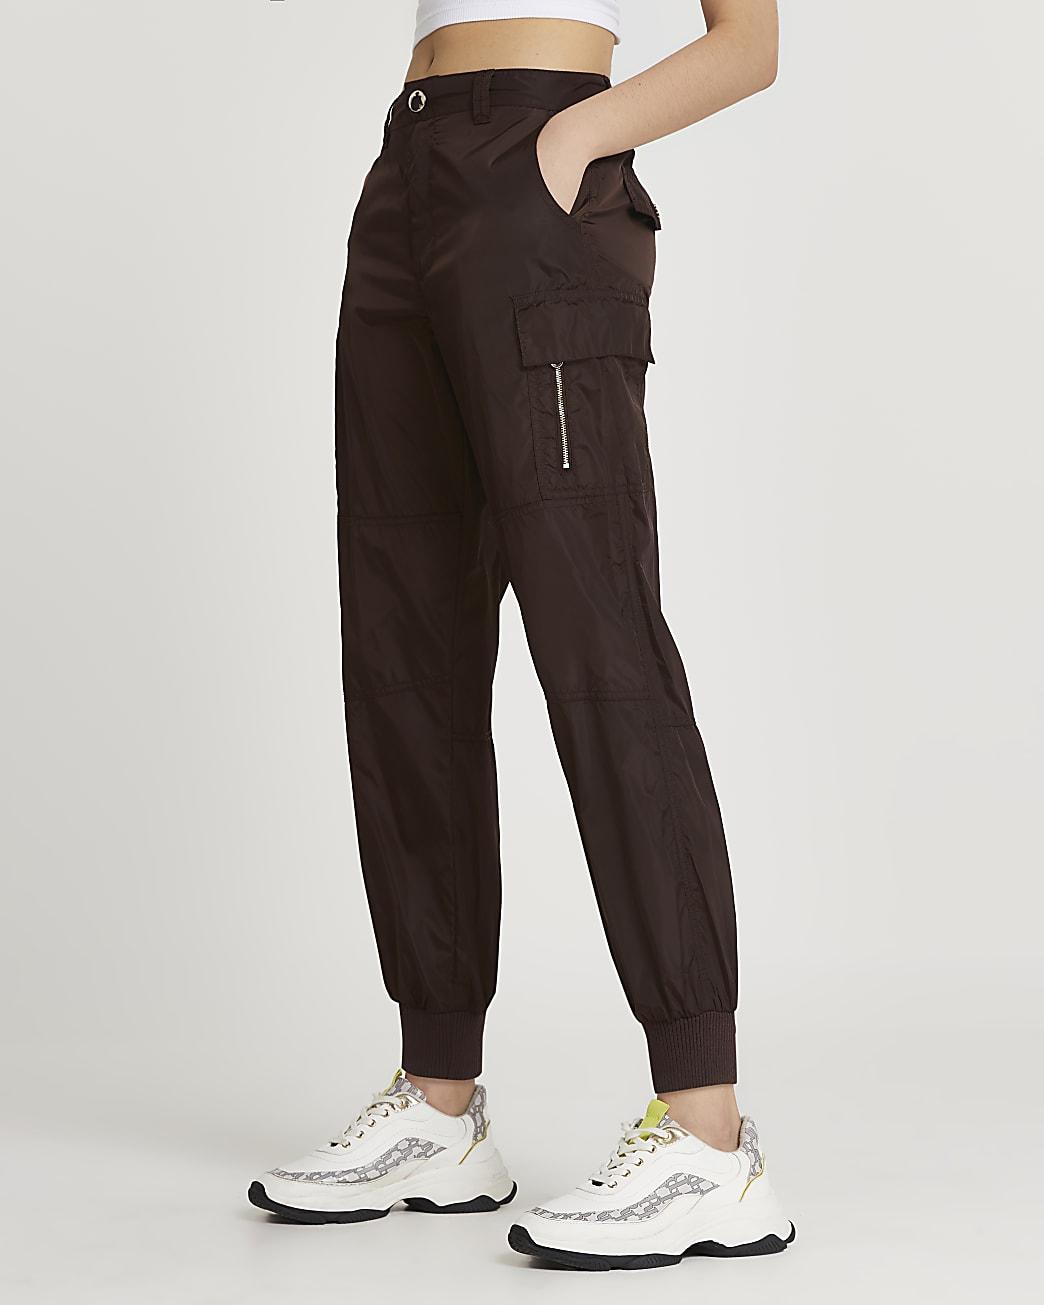 Brown utility nylon cuffed trousers